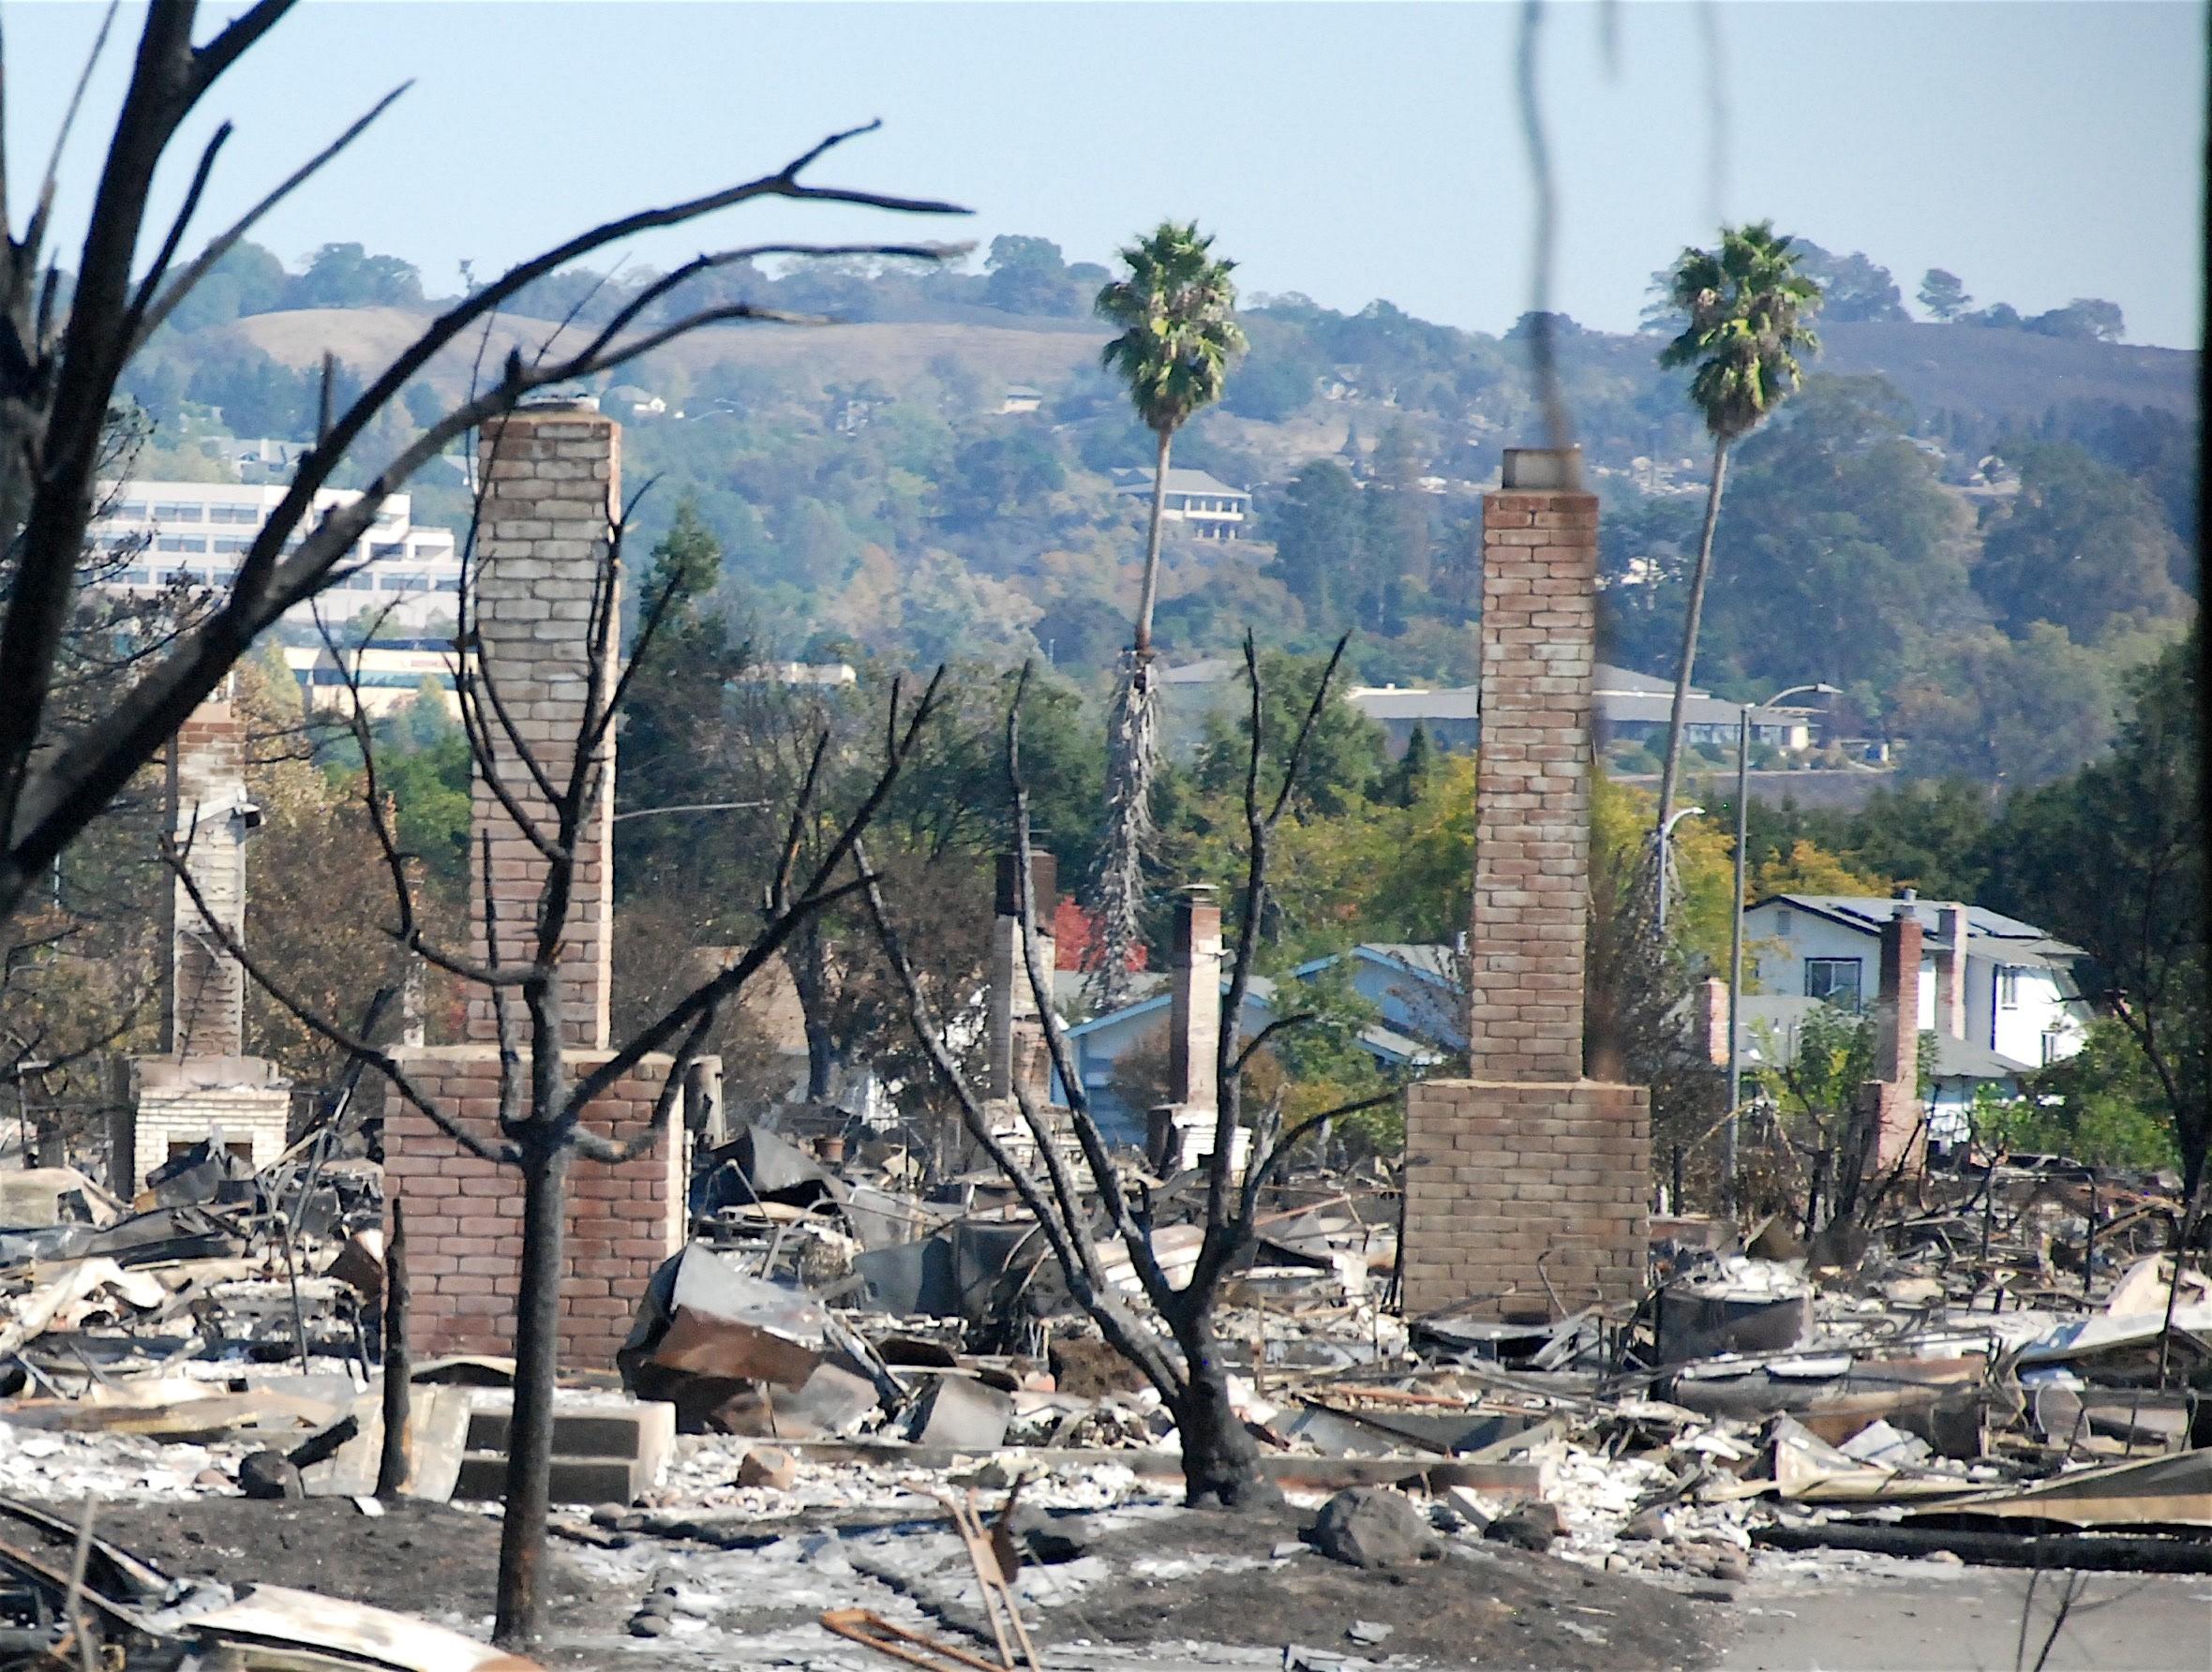 Santa Rosa neighborhood devastated by fire